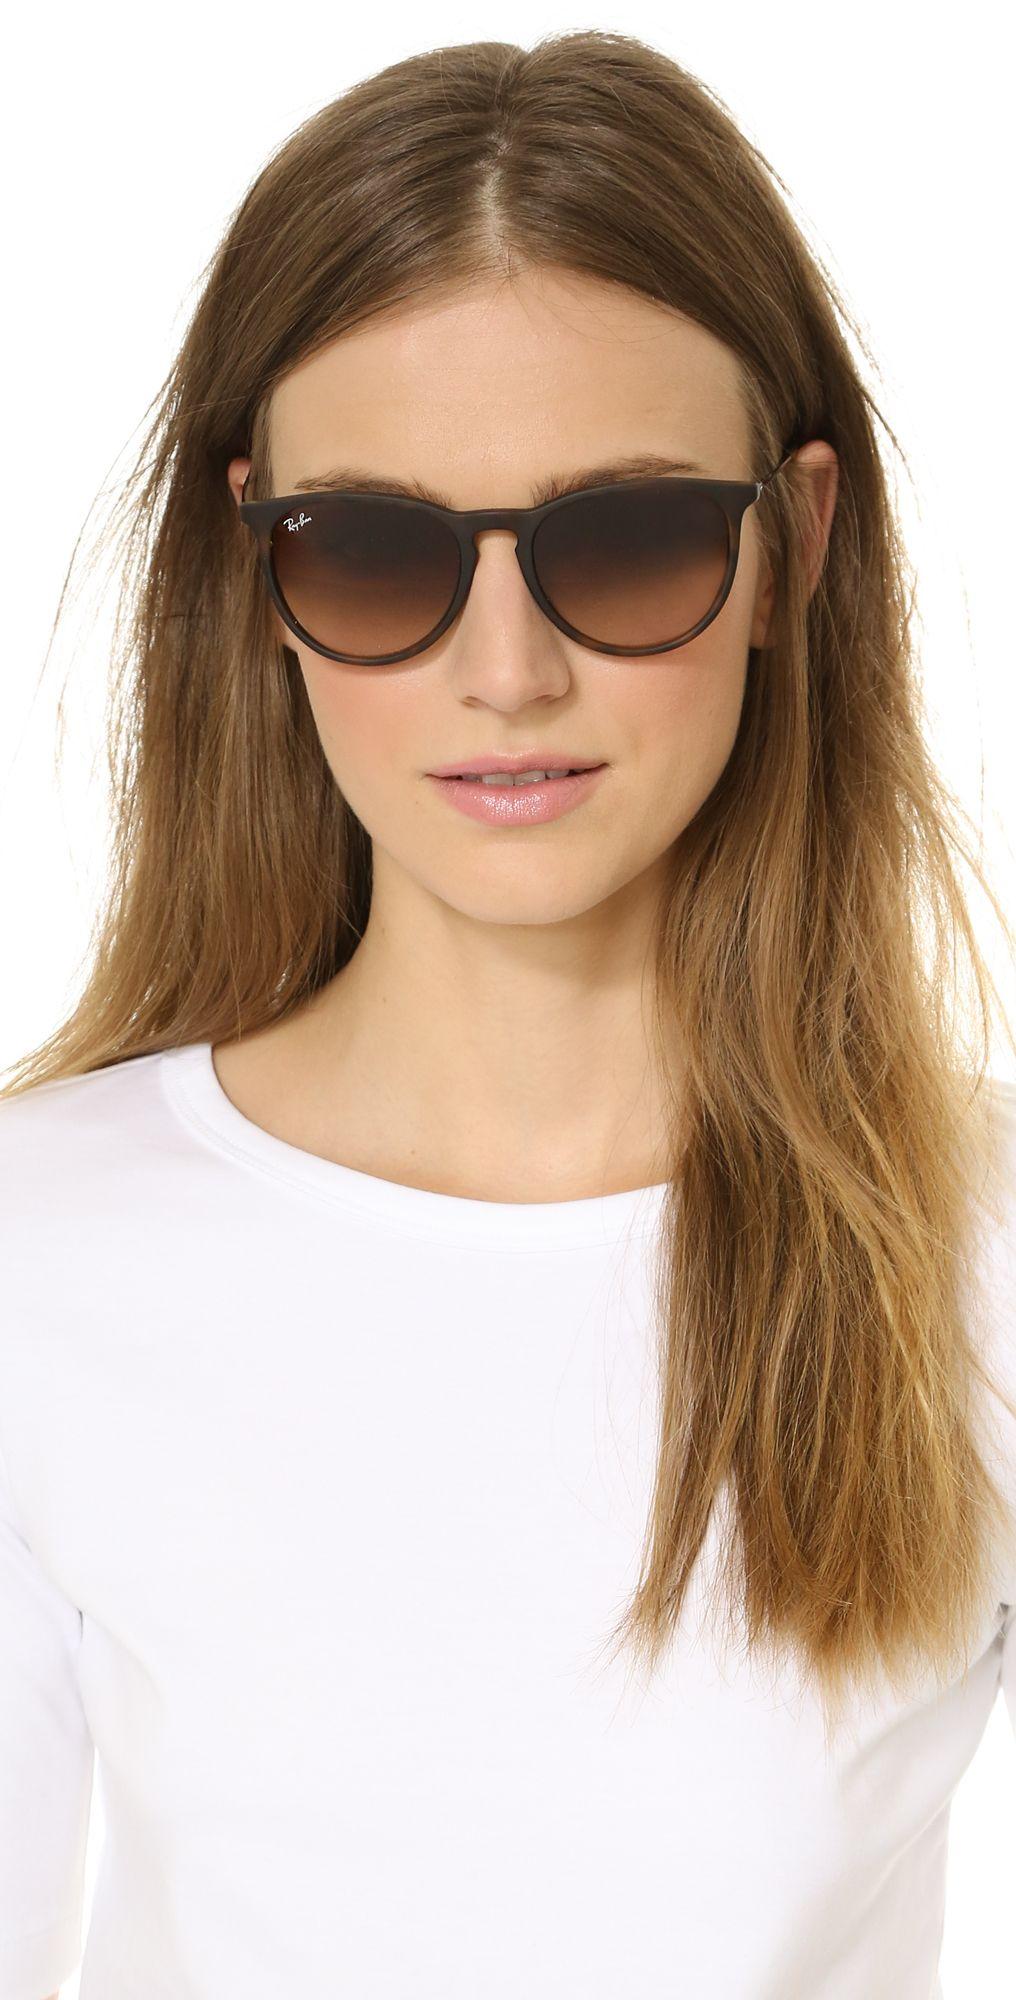 Erika Sunglasses em 2019   Glasses Style   Ray ban sunglasses, Ray ... 591cfb858a